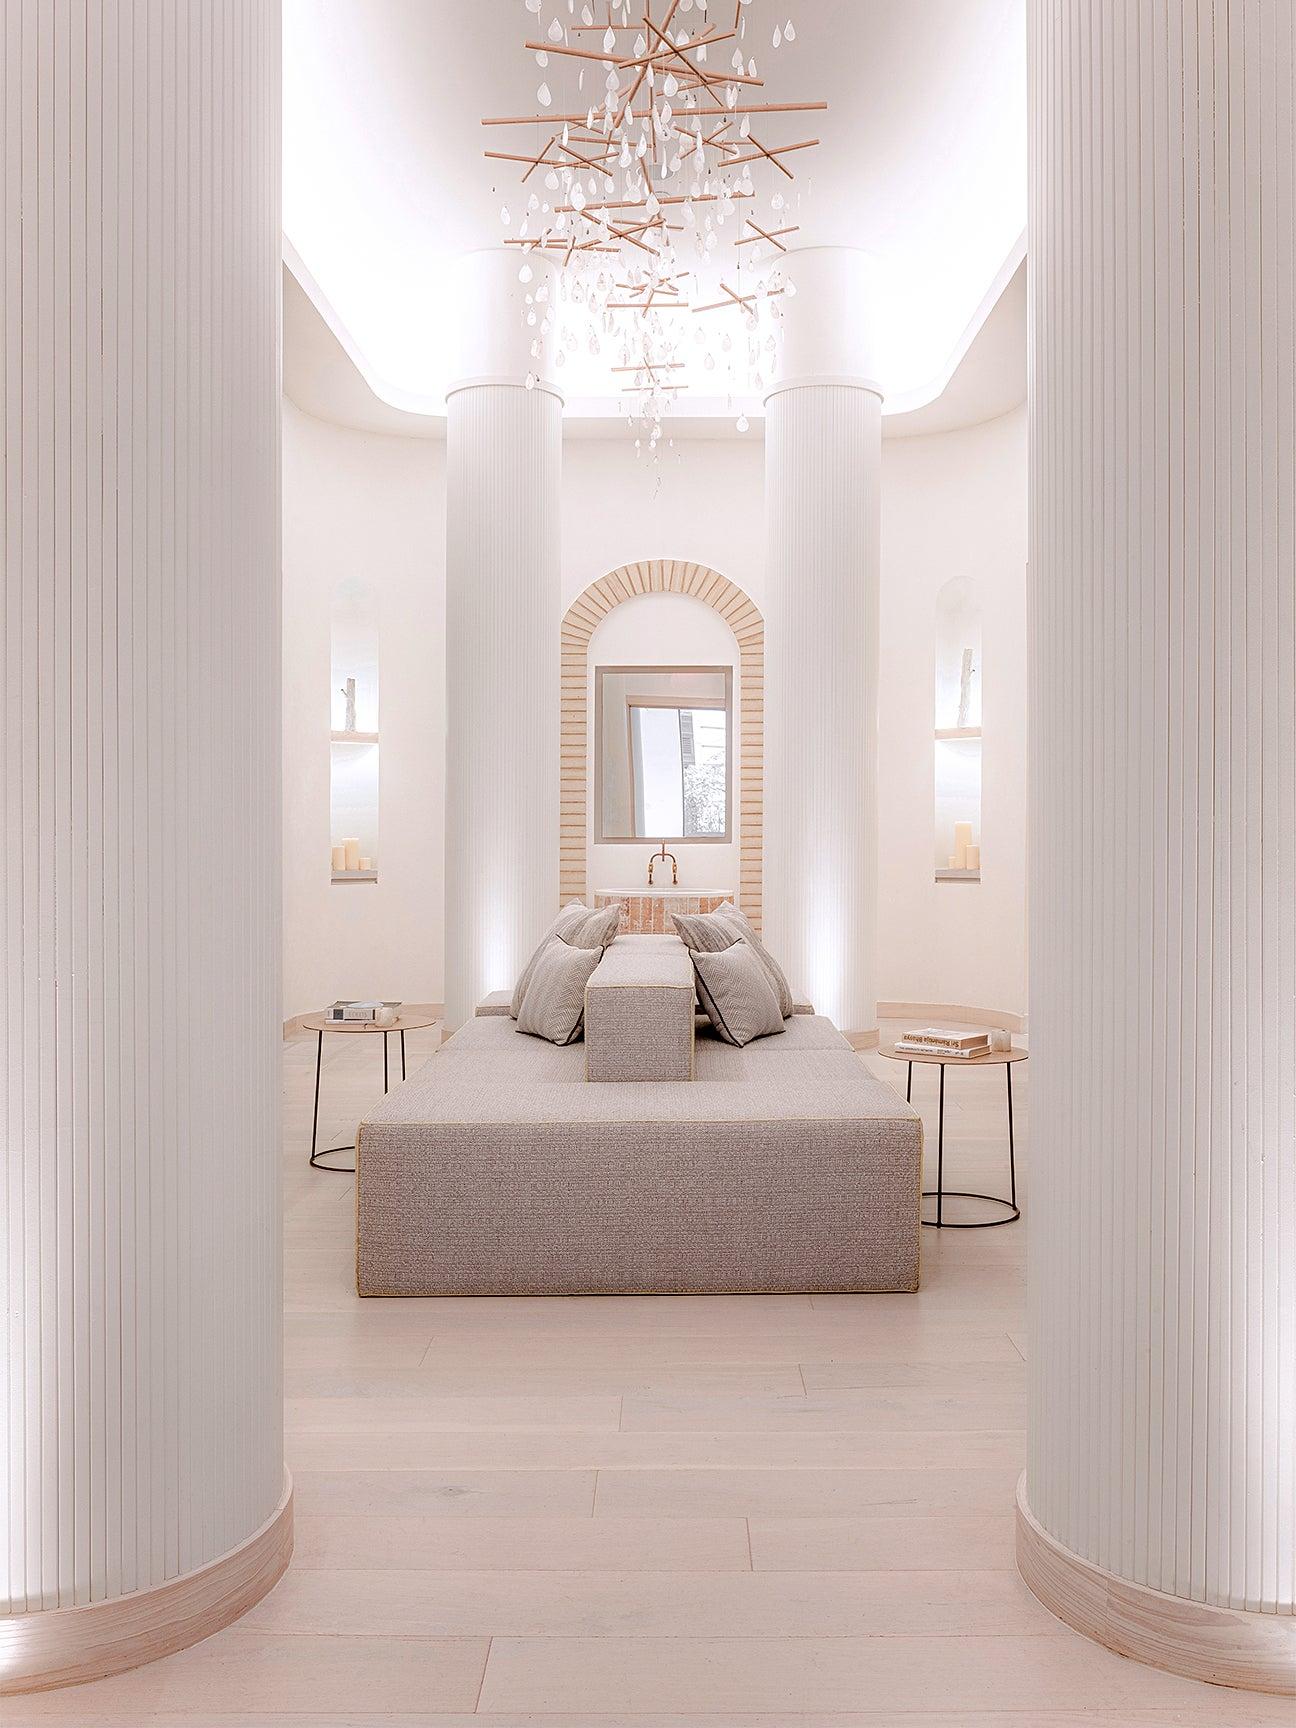 Sleek white lounge area